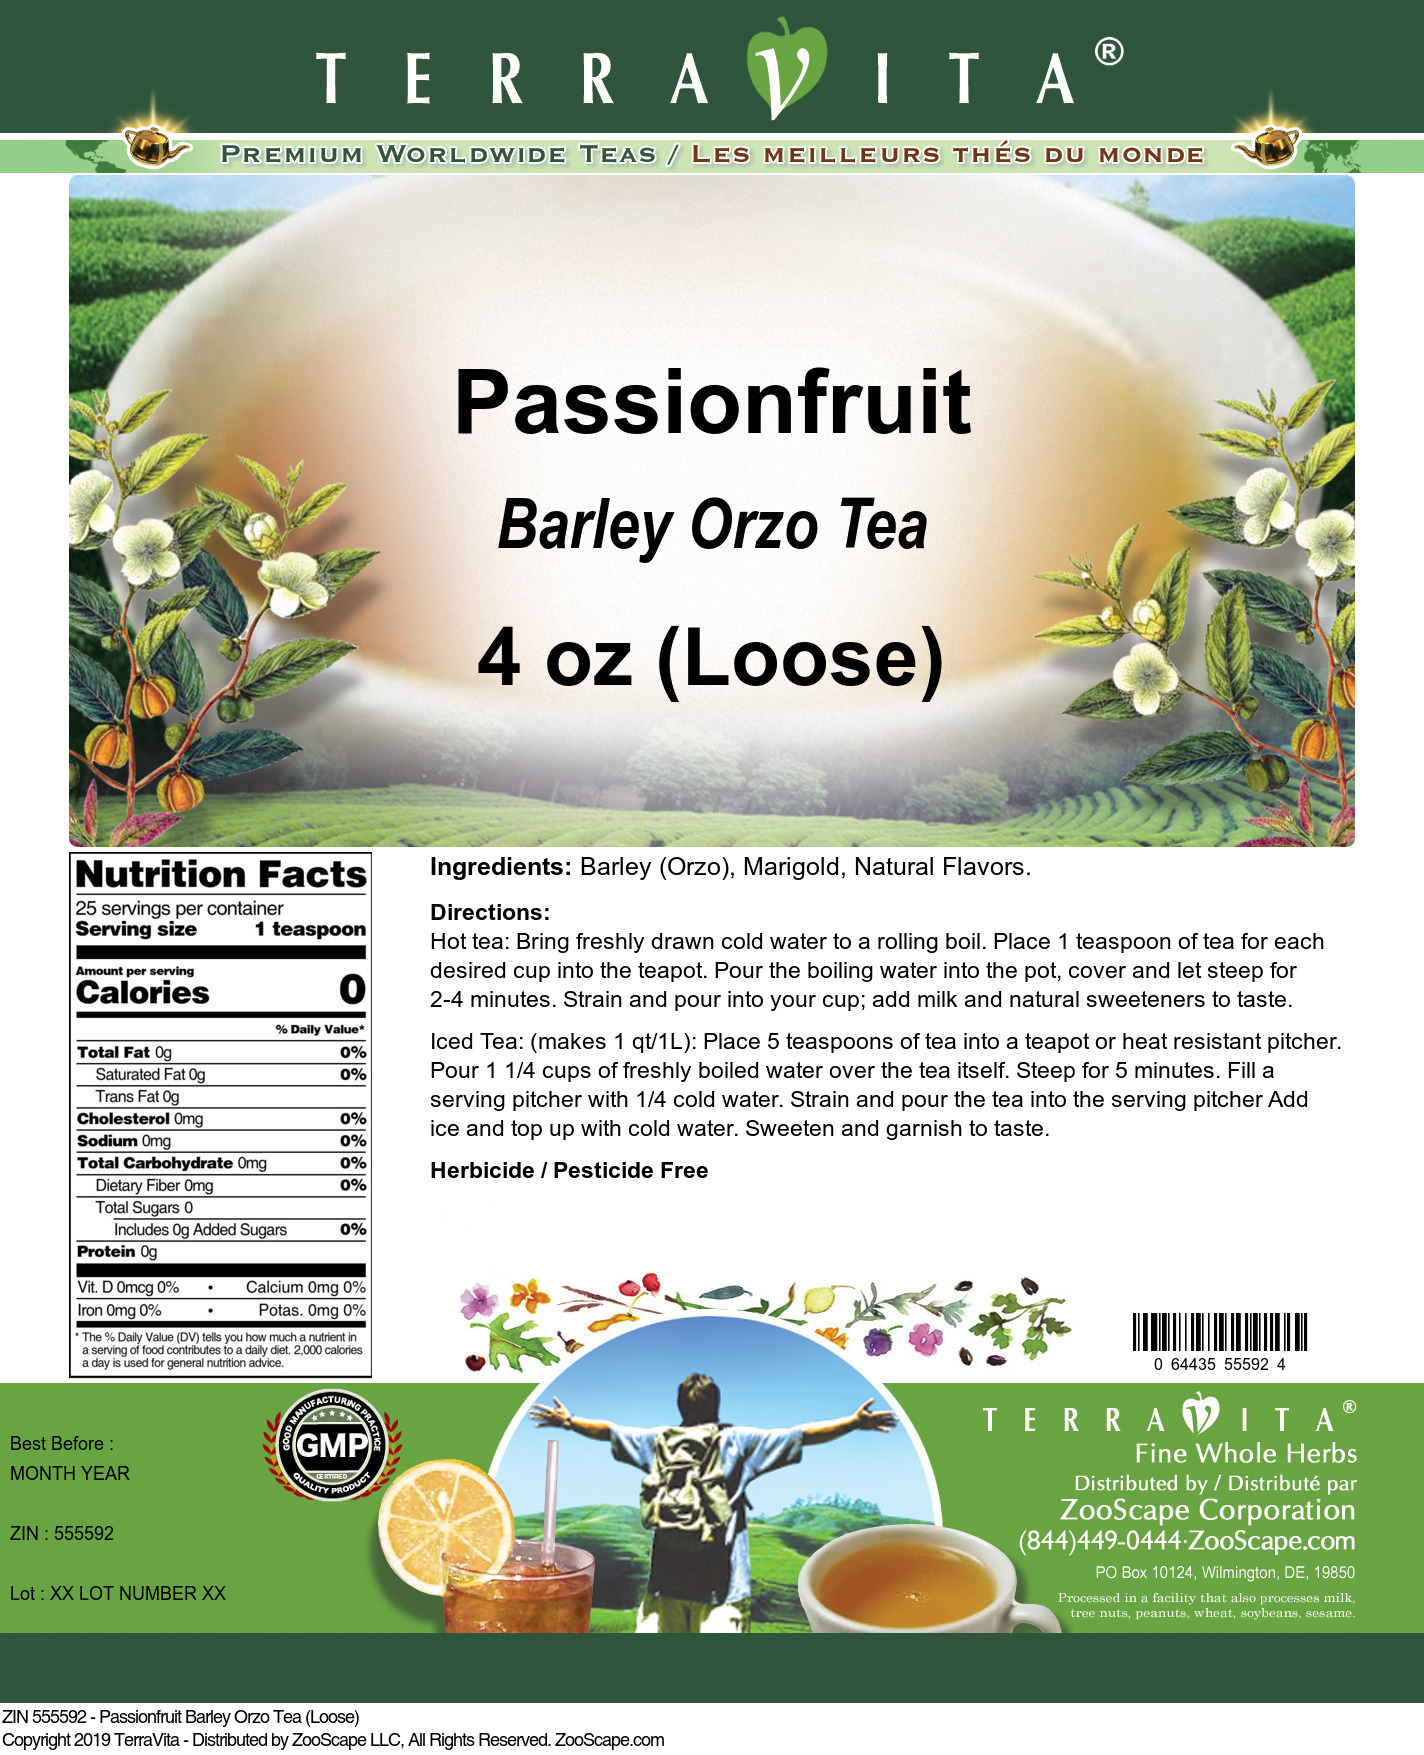 Passionfruit Barley Orzo